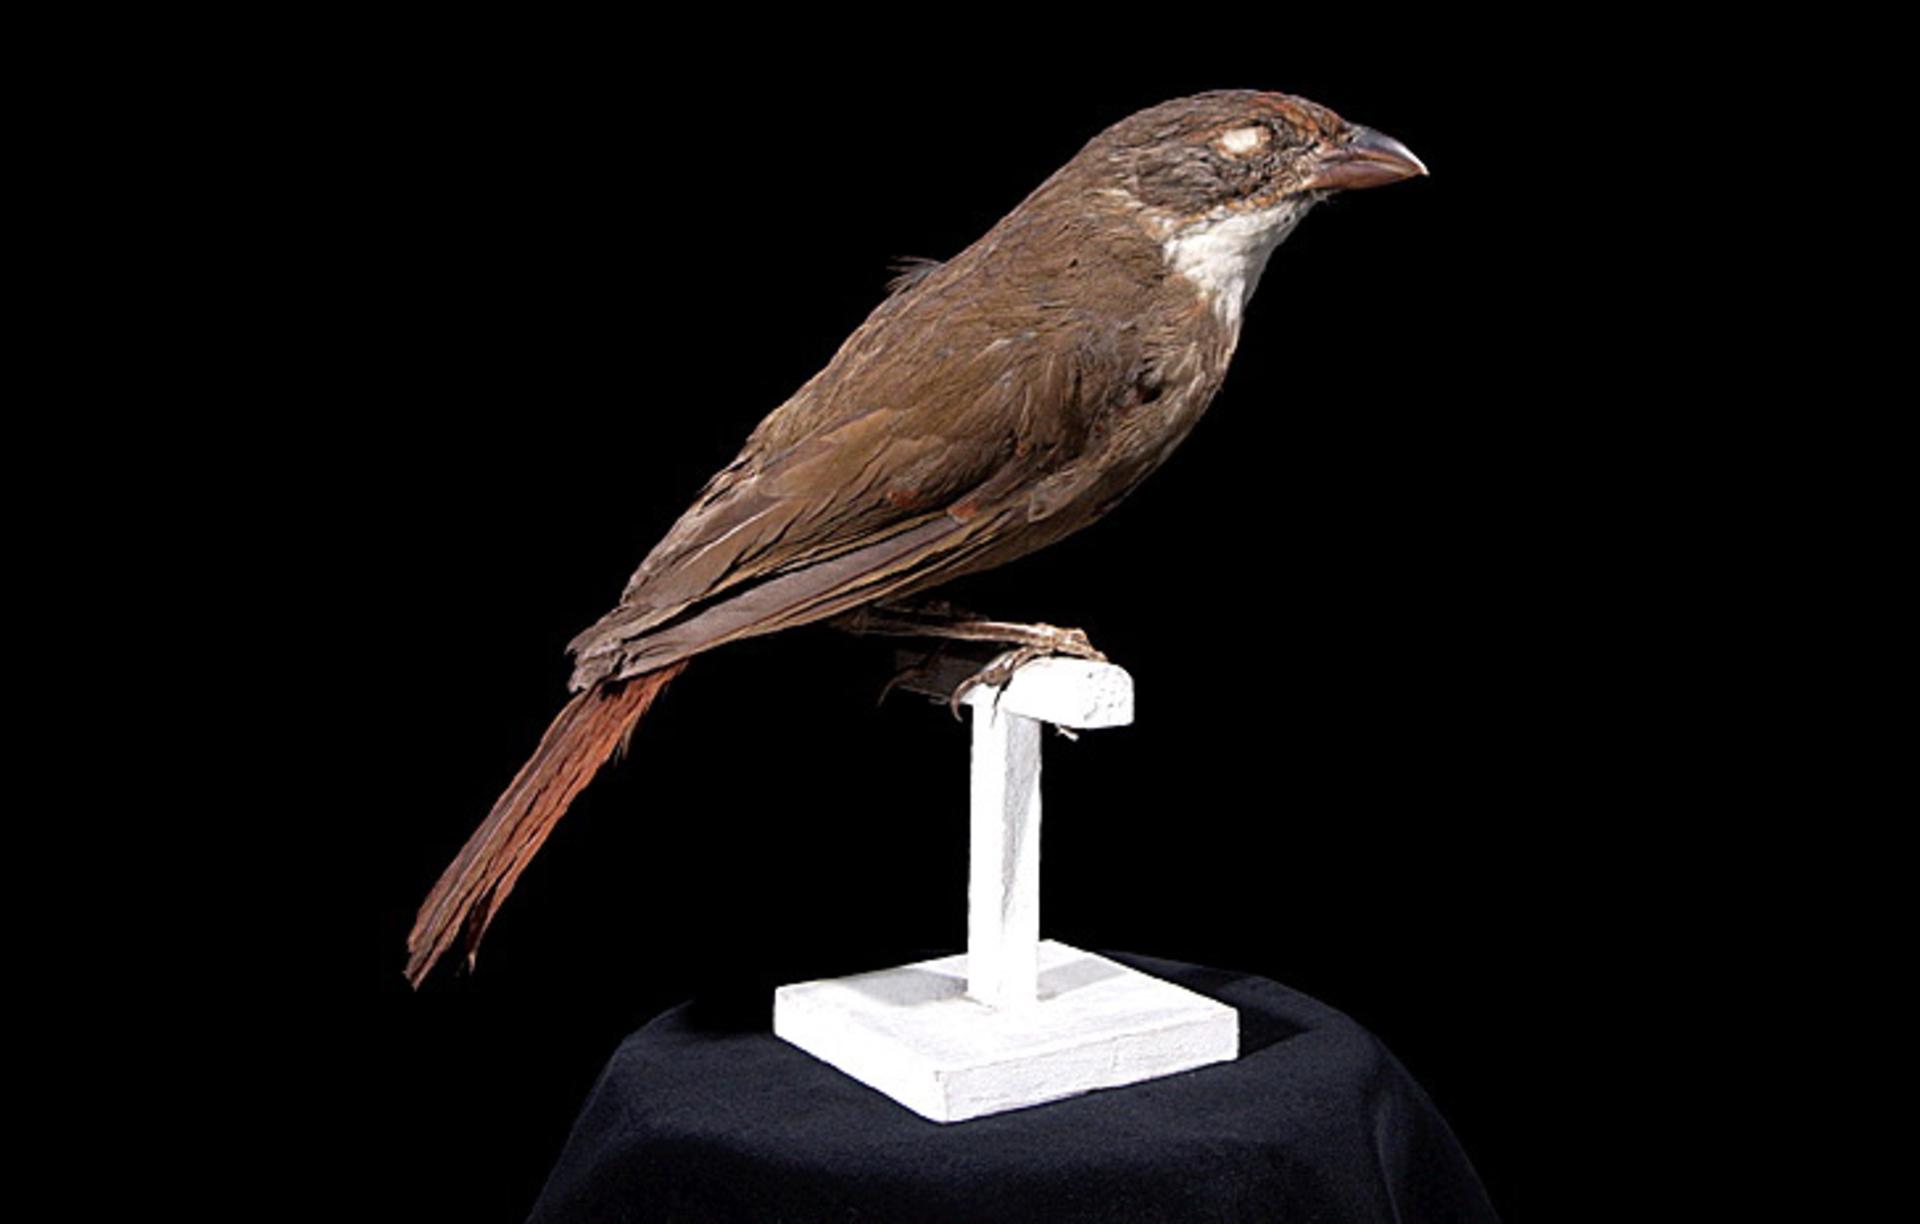 RMNH.AVES.110054 | Turnagra capensis turnagra (Schlegel, 1865)